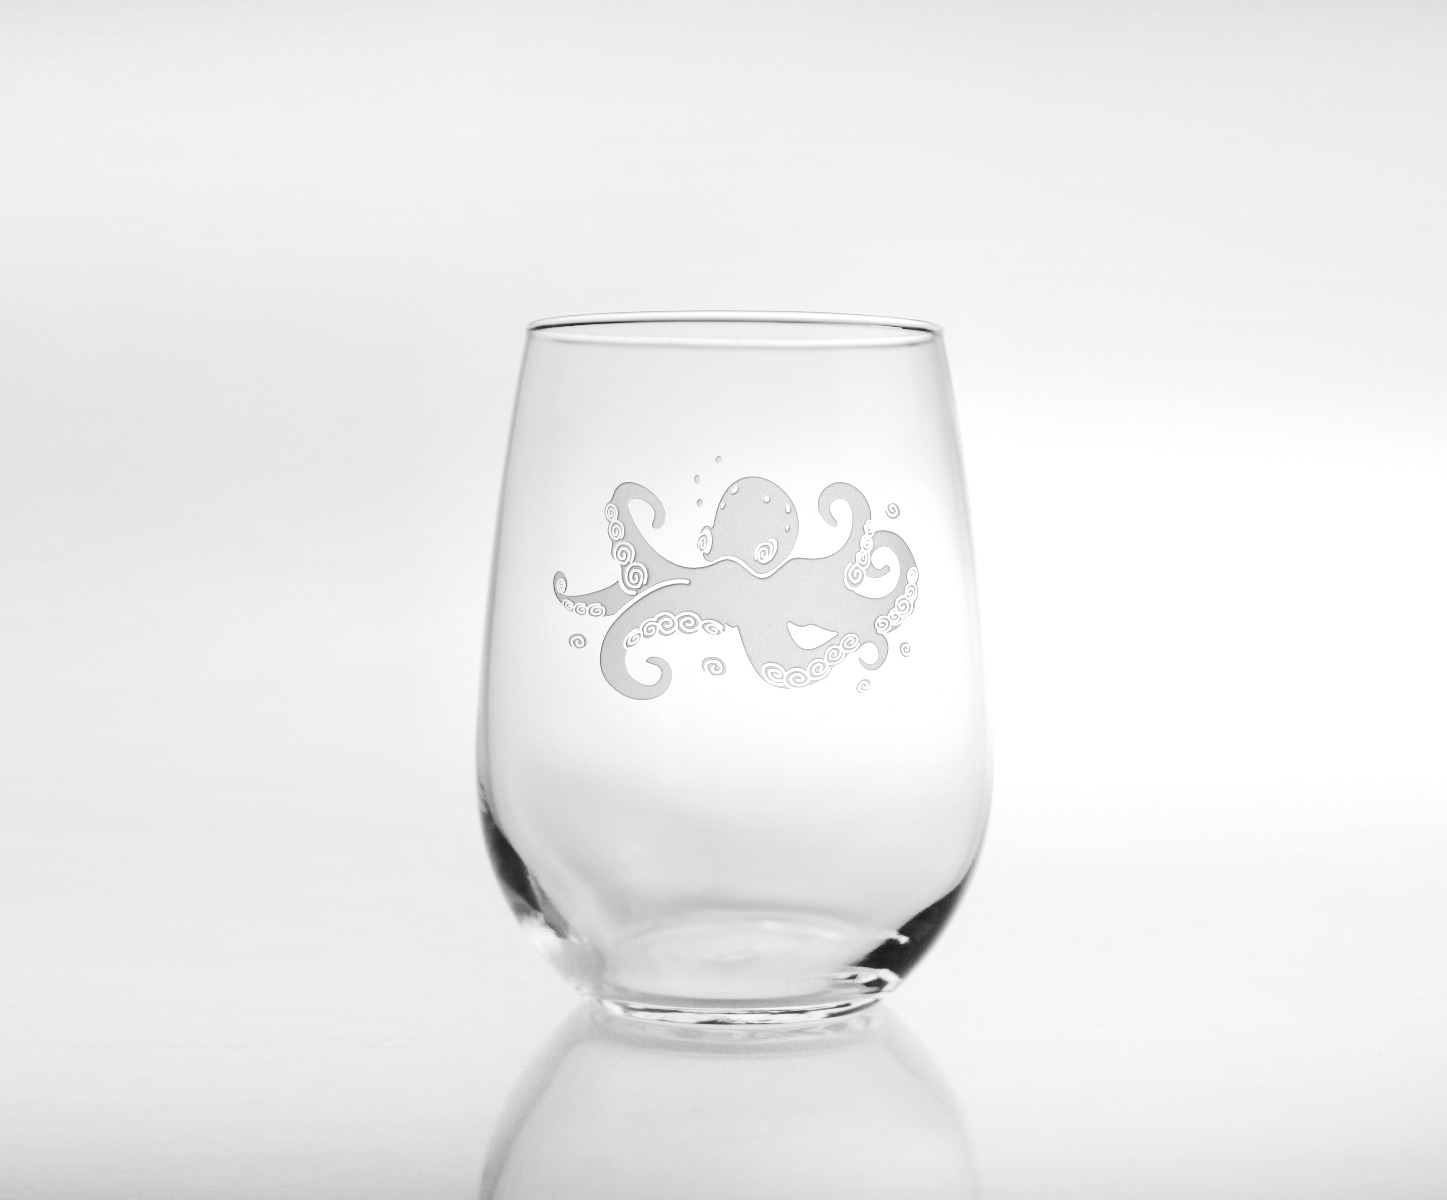 Octopus Stemless White Wine Glasses (Set of 4)